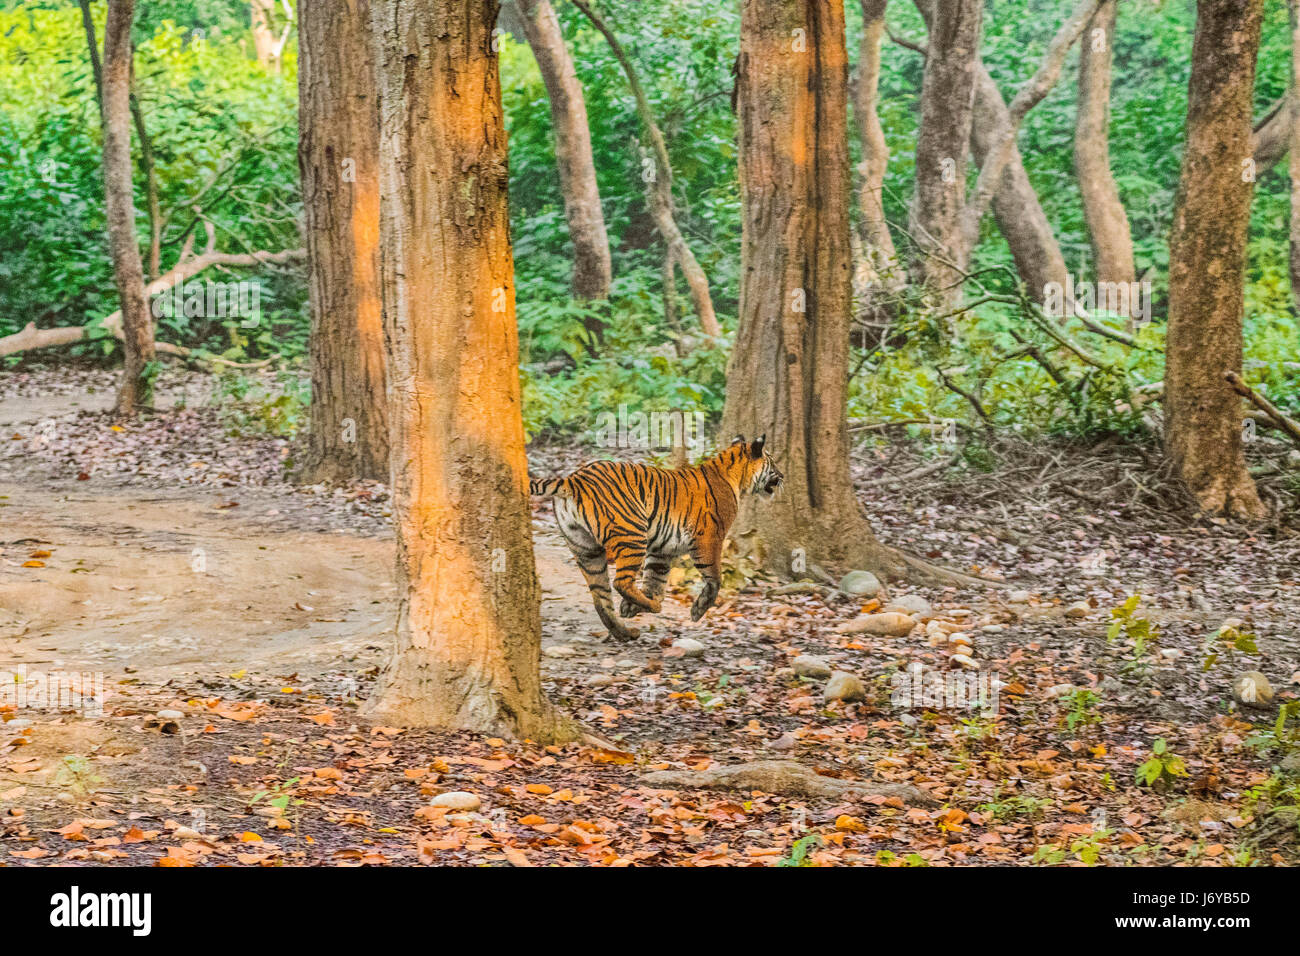 Tiger Chasing - Stock Image